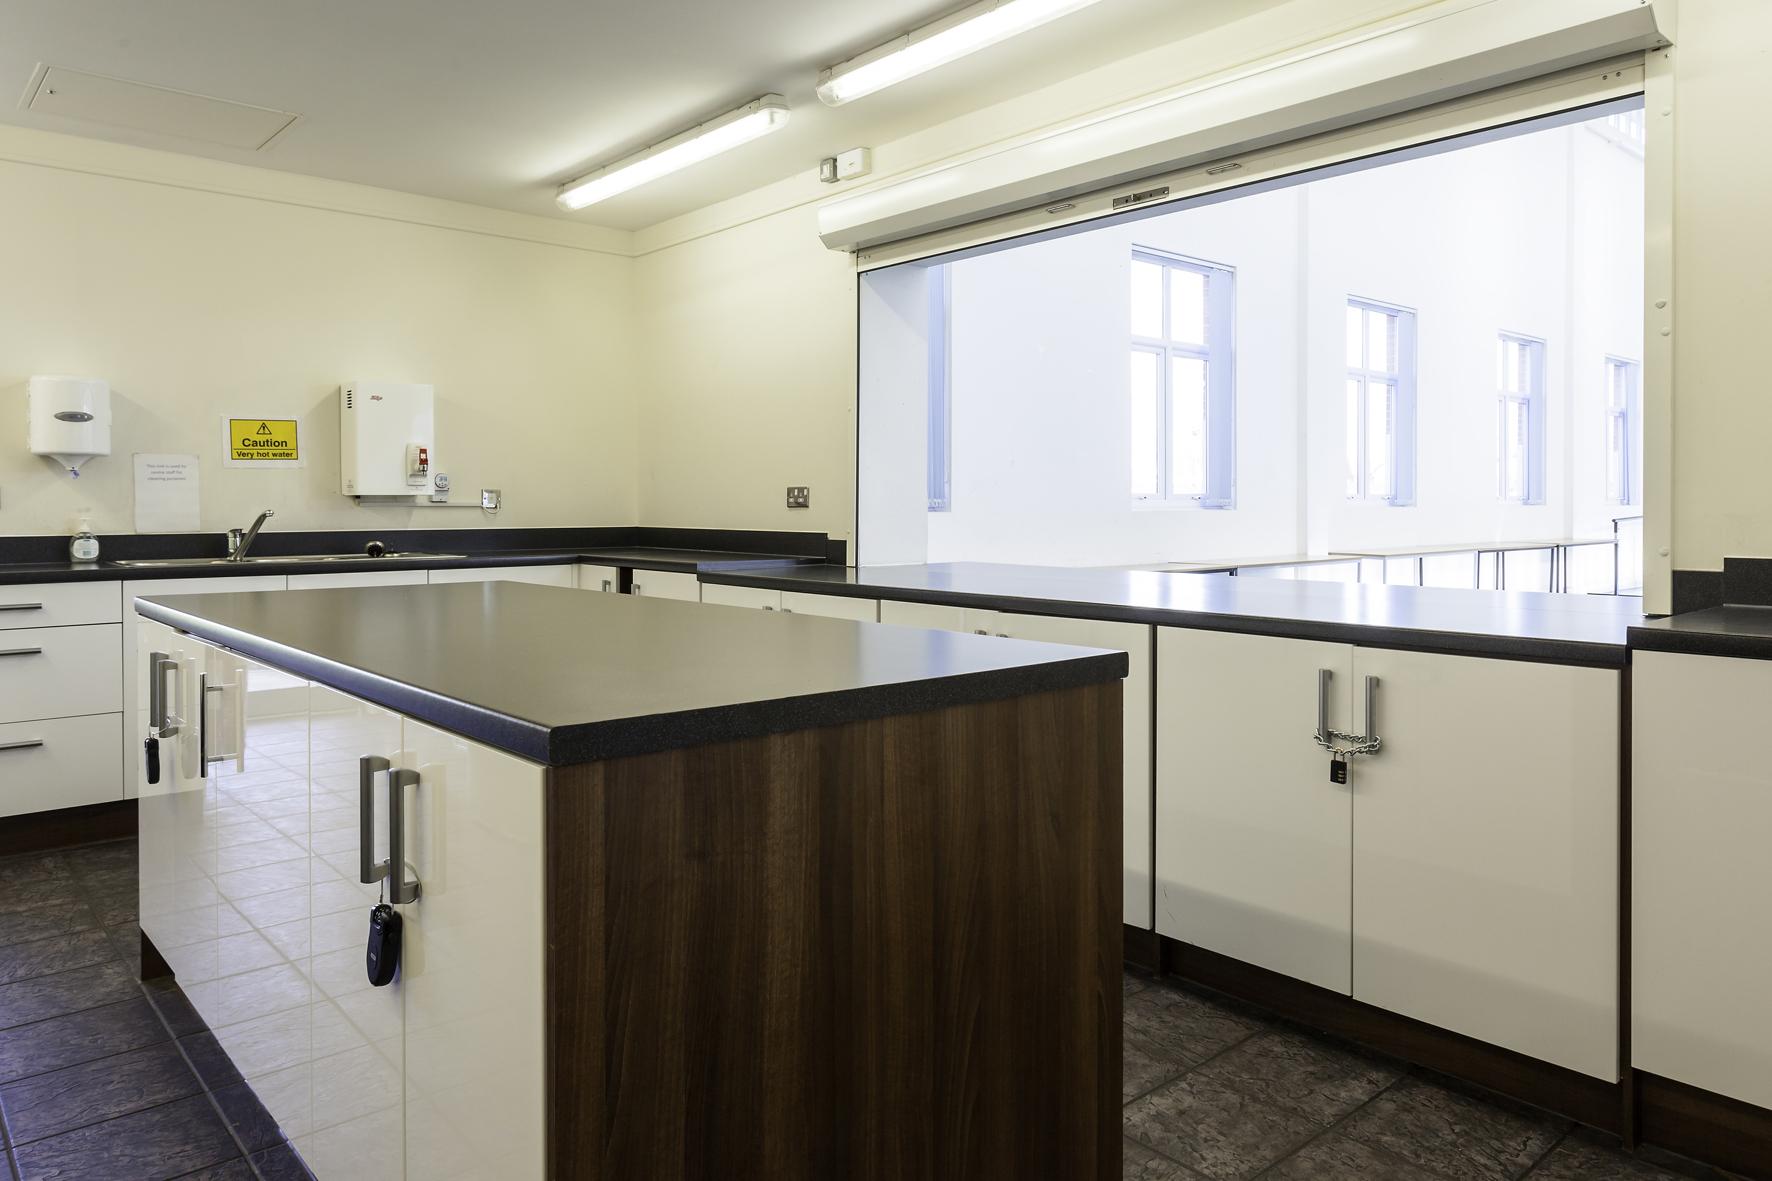 Community Centre Kitchen